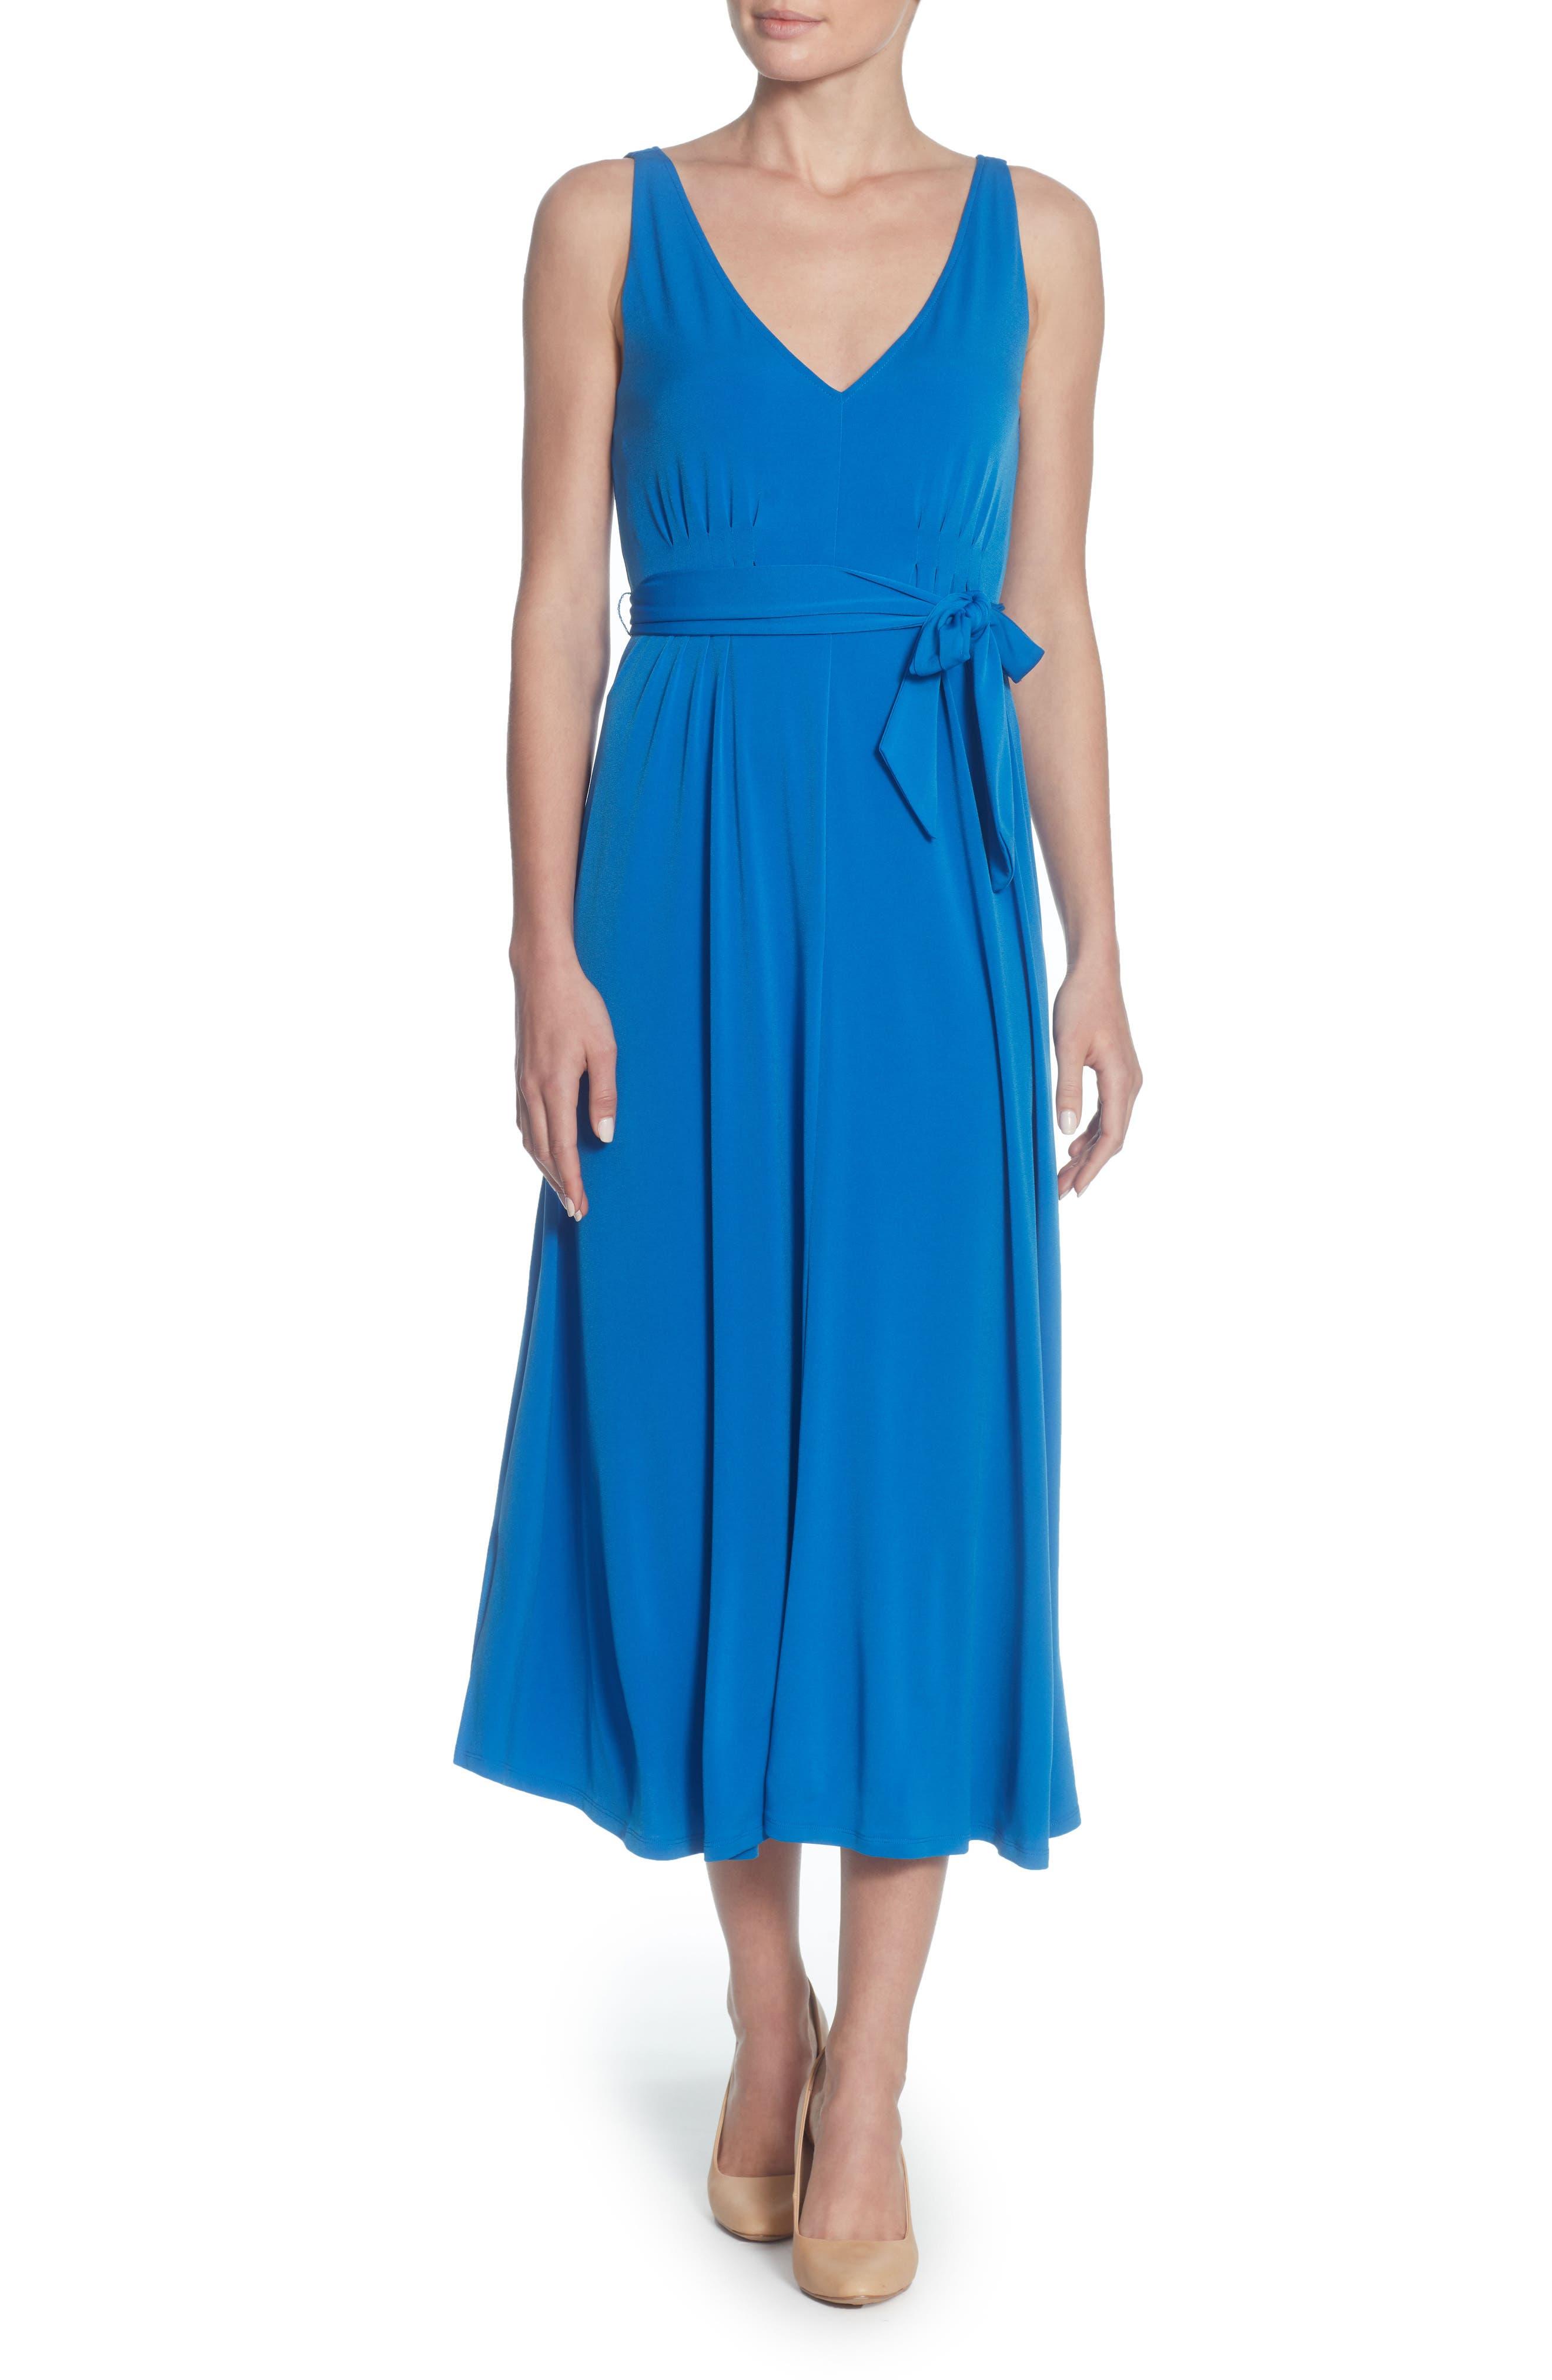 Main Image - Catherine Catherine Malandrino Lindy Midi Dress